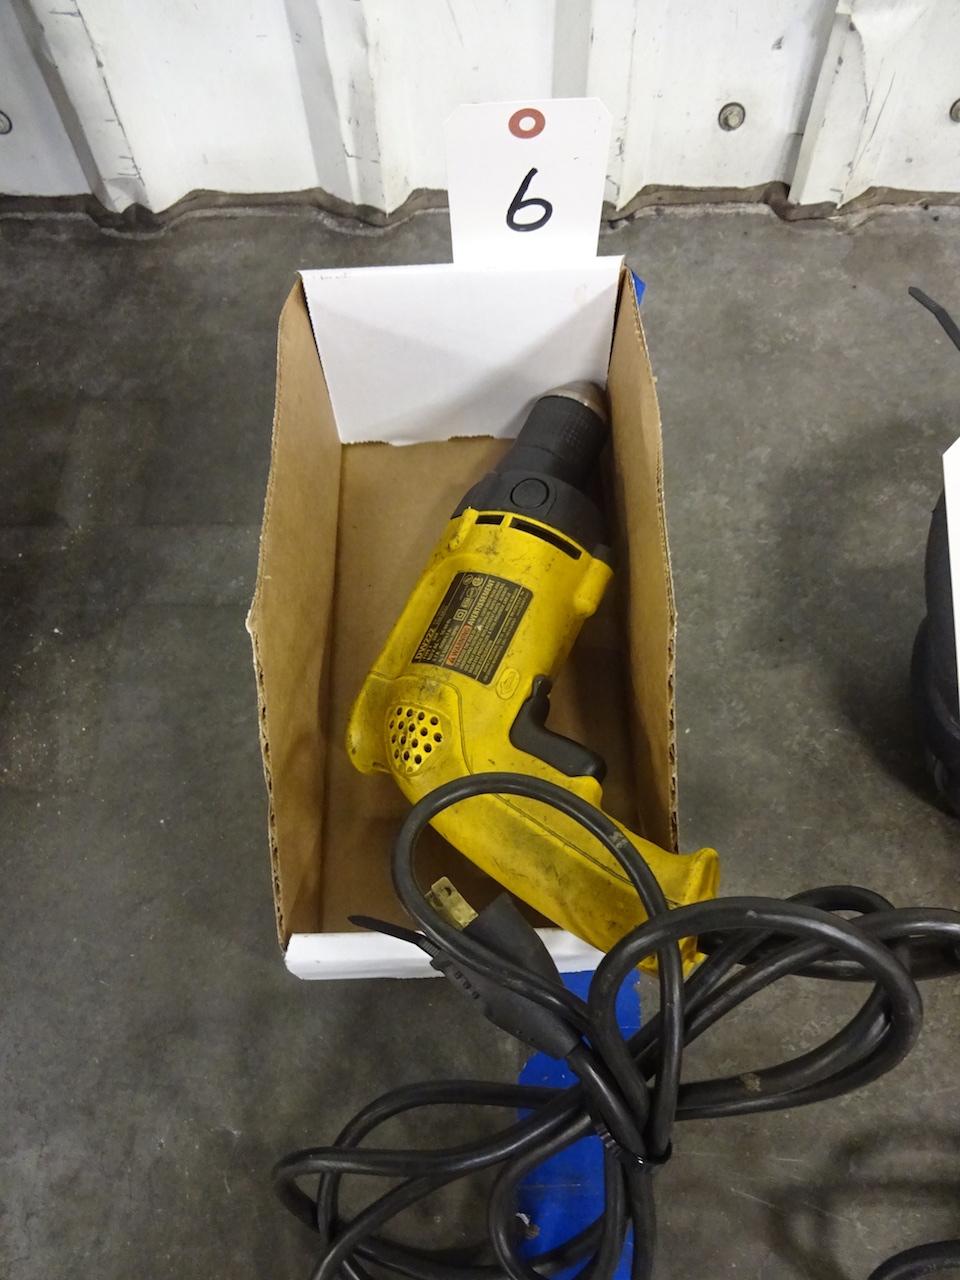 Lot 6 - Dewalt 3/8 in. Model DW222 VSR Electric Drill